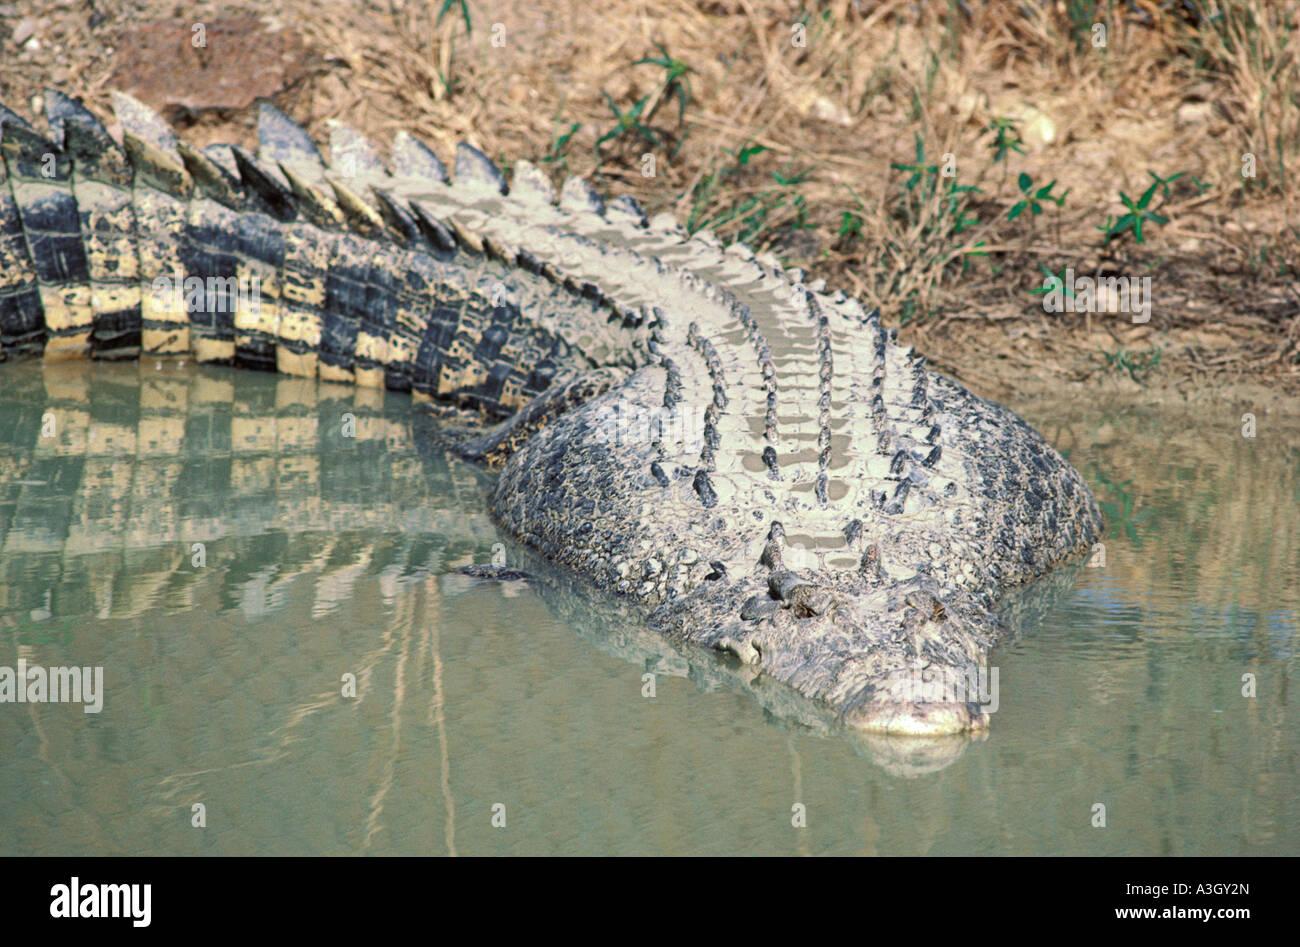 Saltwater Crocodile or Estuarine Crocodile Crocodylus porosus Kakadu National Park Northern Territory Australia - Stock Image